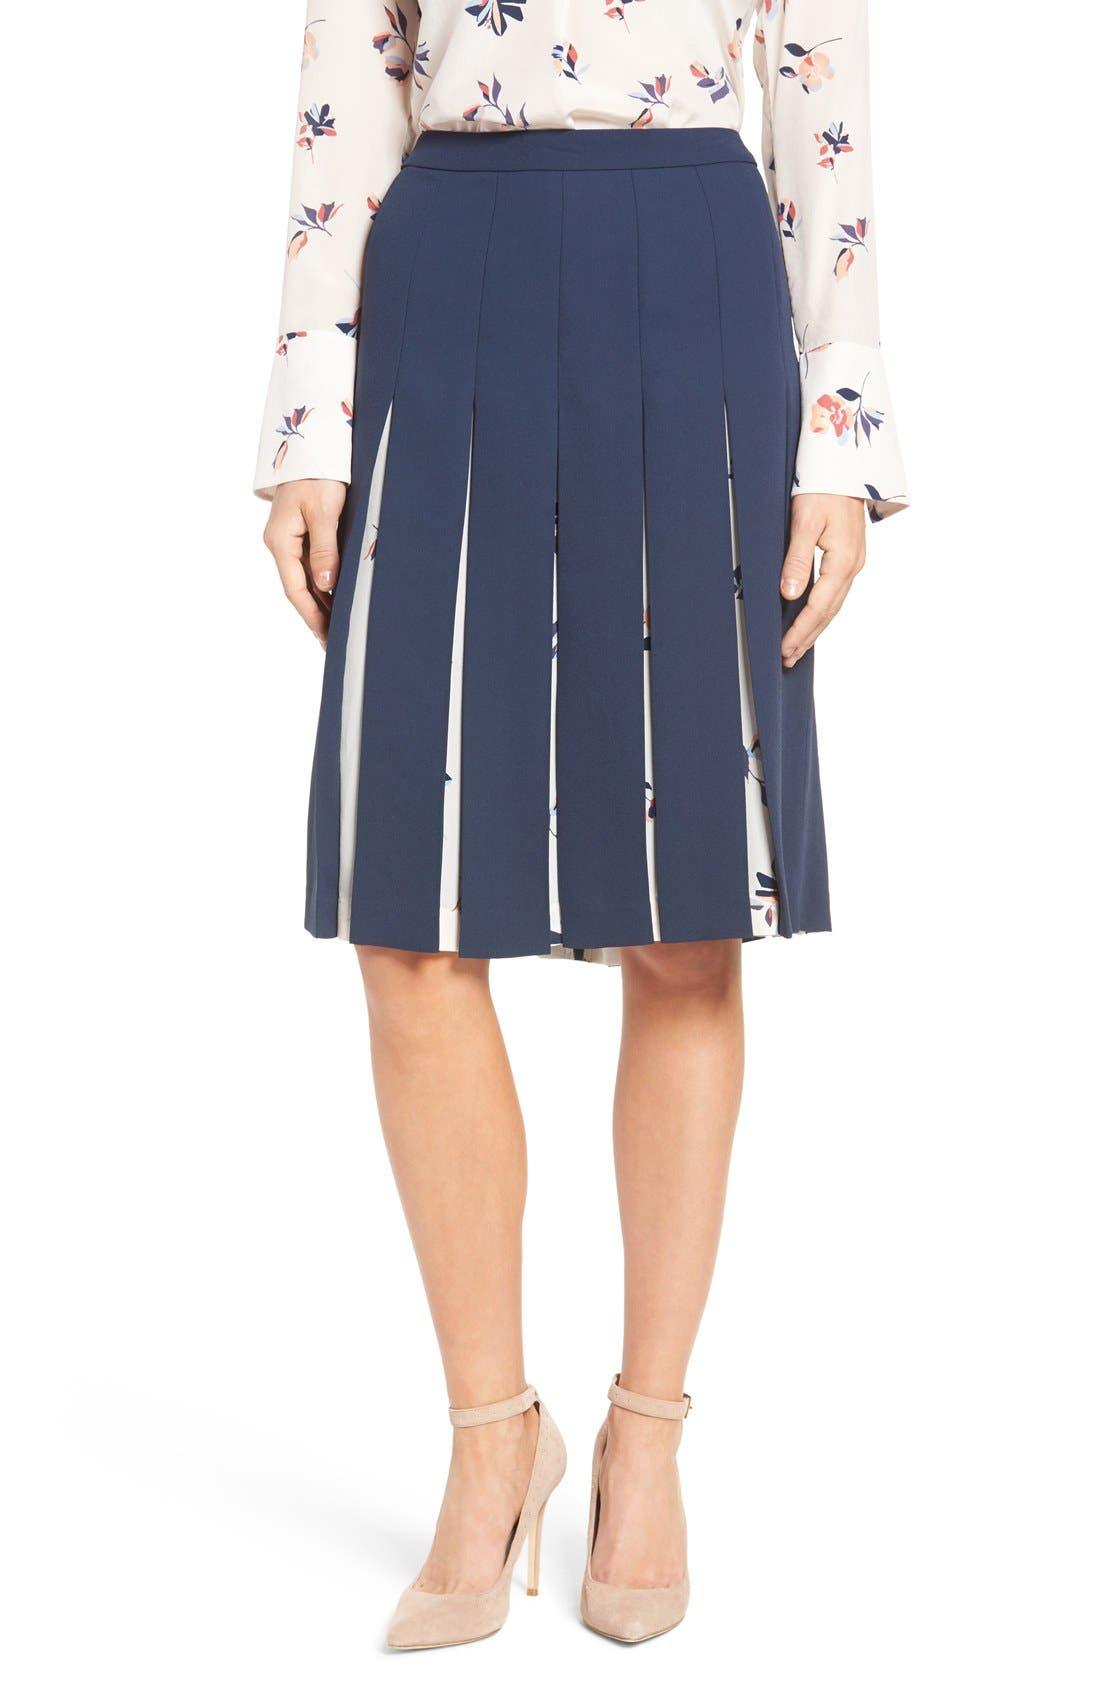 Print Mix Pleated Skirt,                             Alternate thumbnail 10, color,                             410